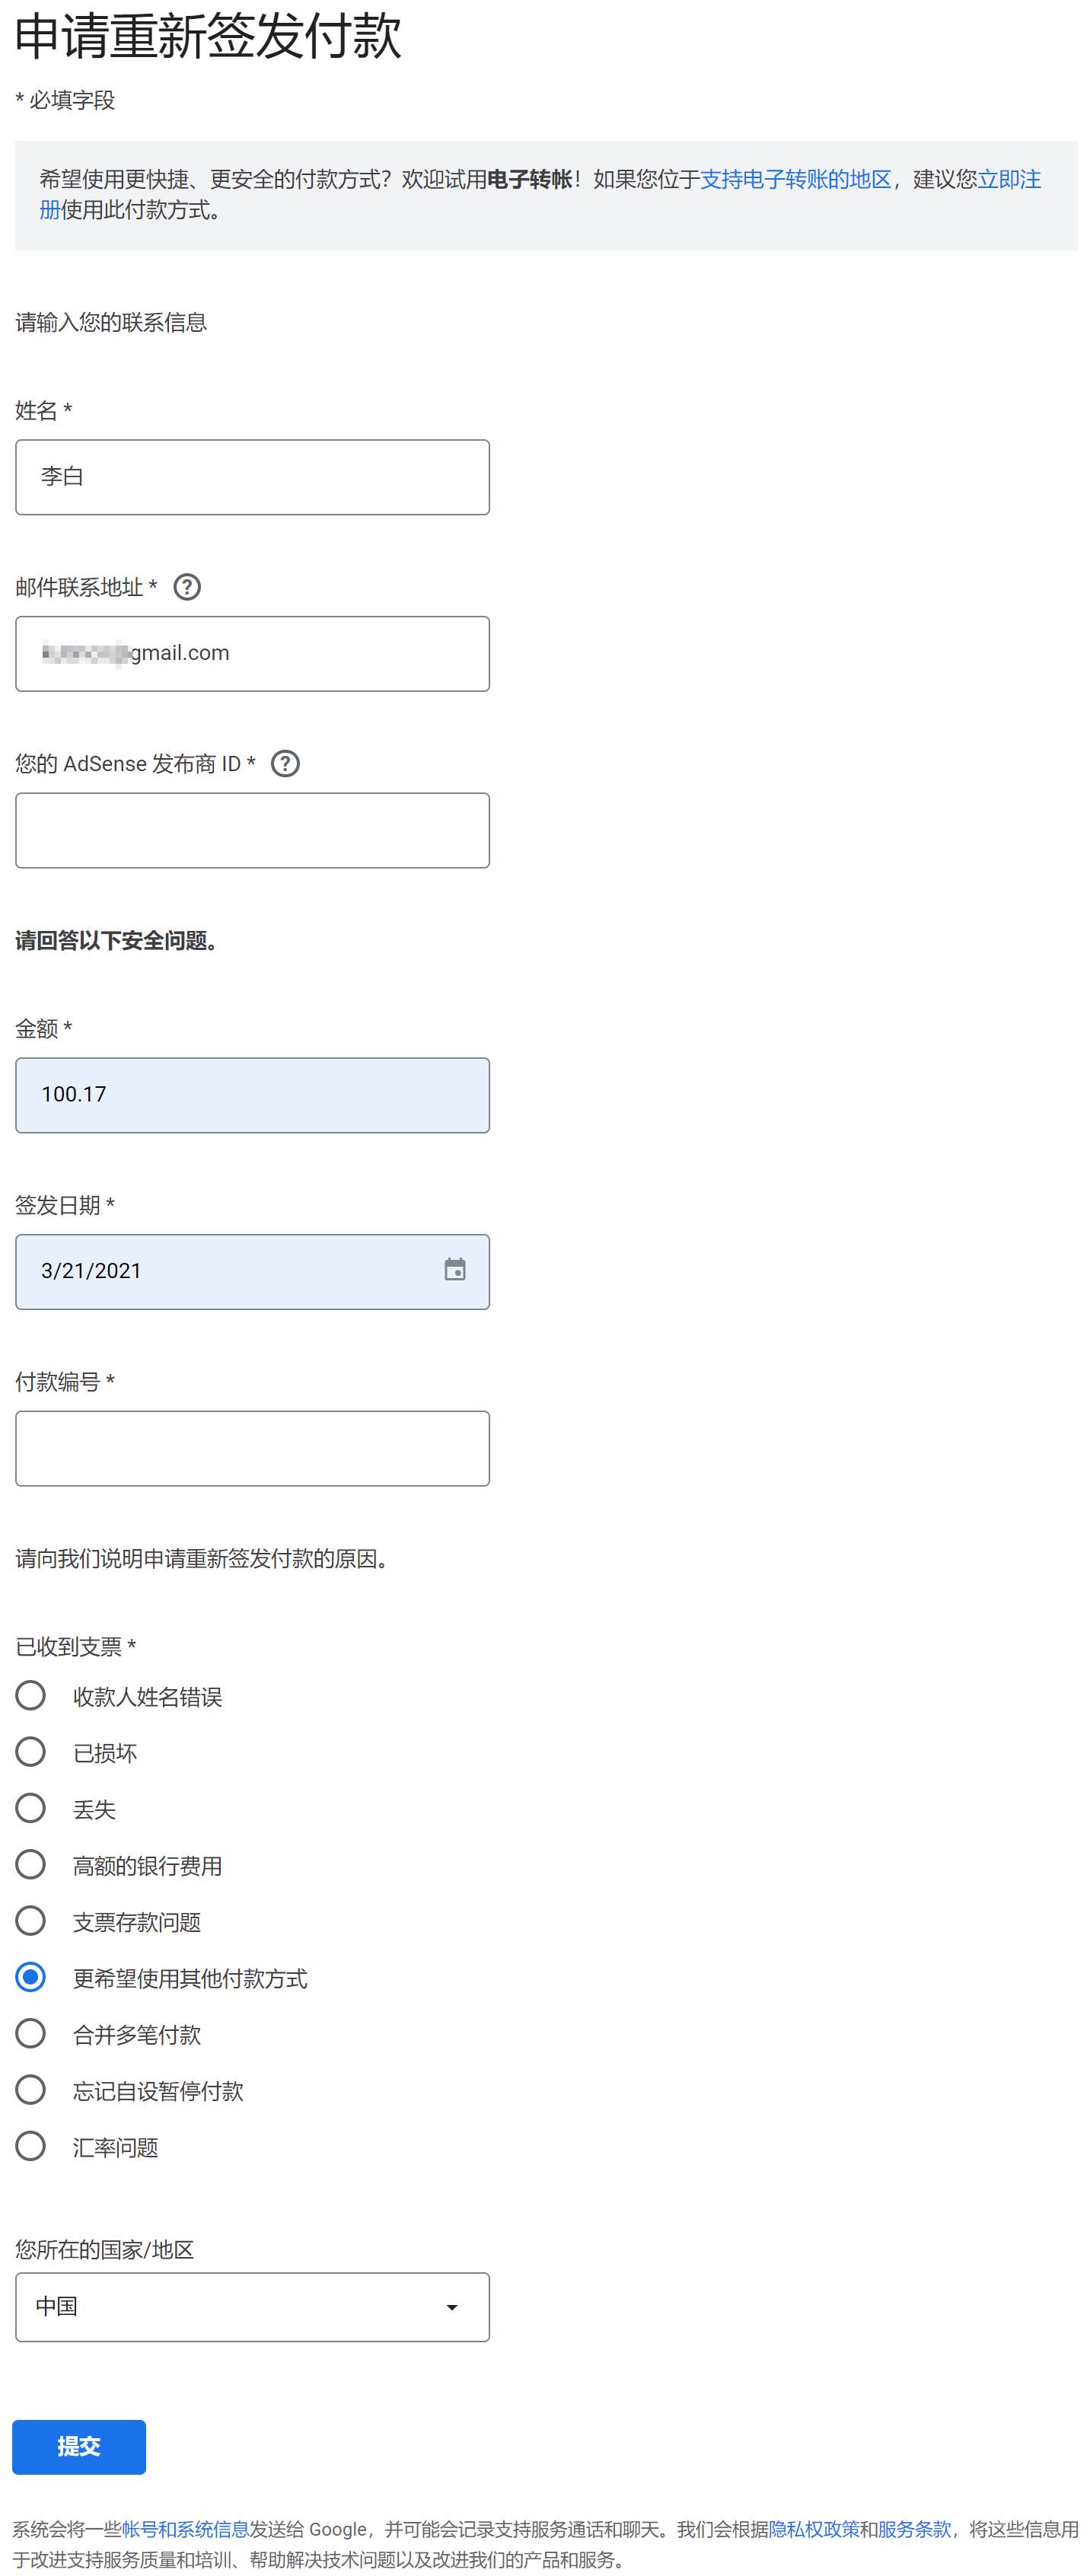 Google Adsense怎么撤销西联汇款申请重新签发的方法